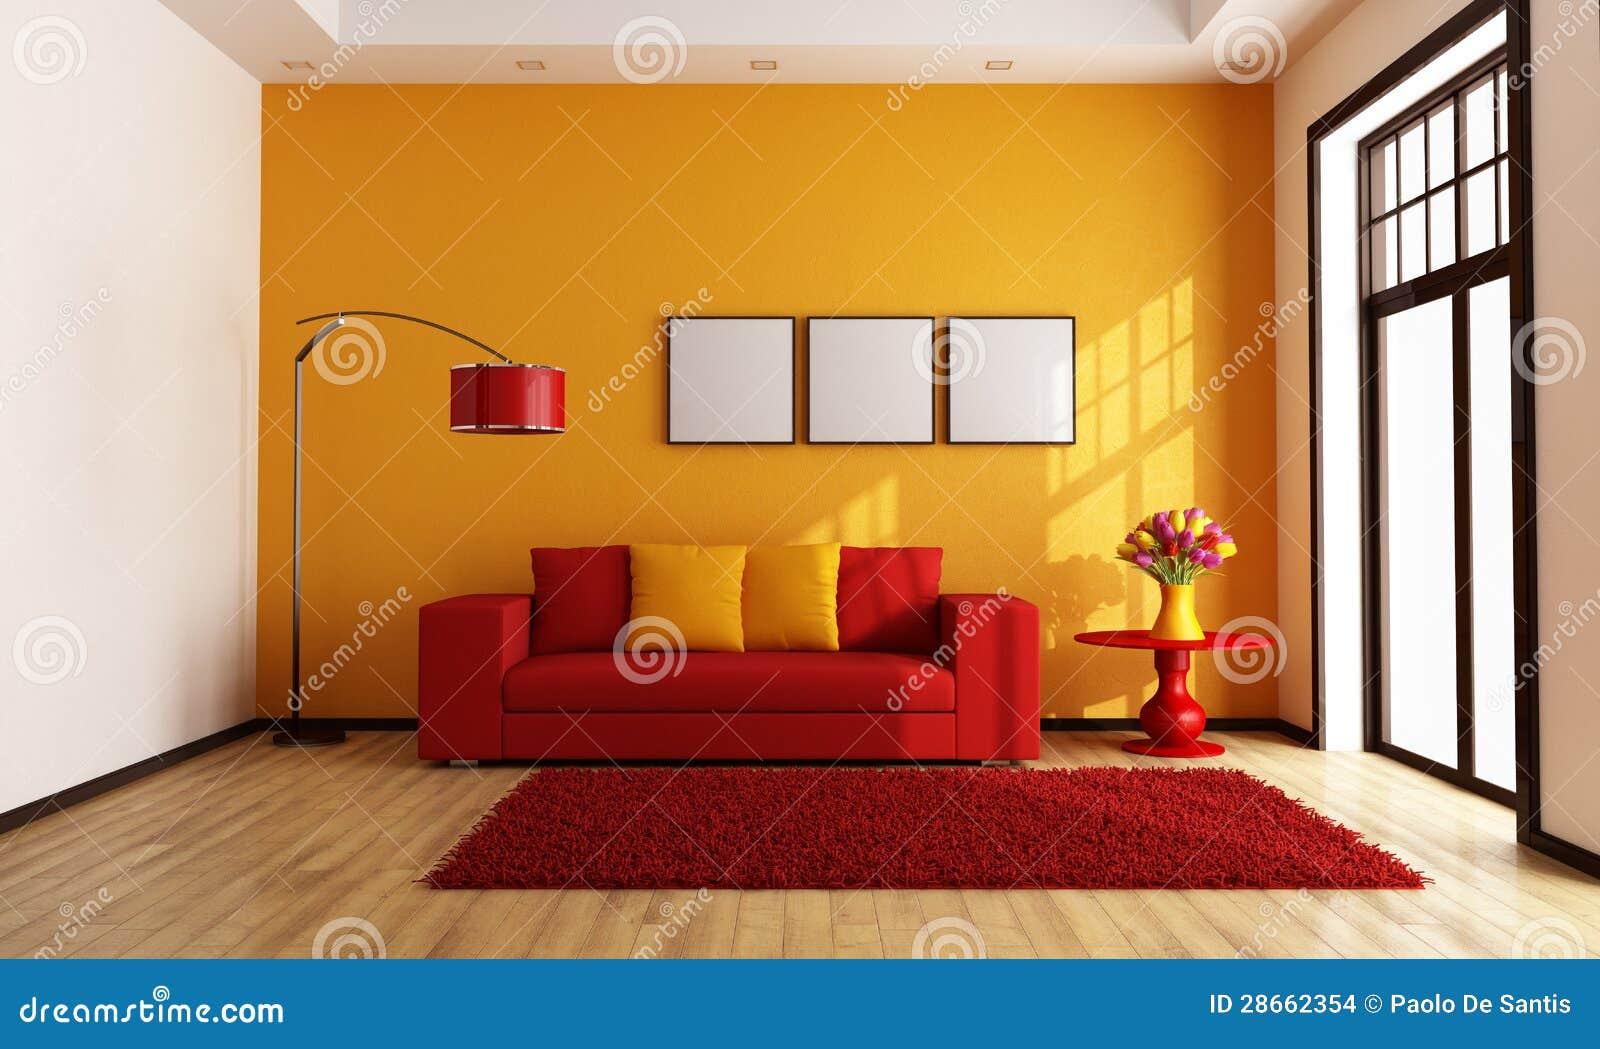 Minimalistische Oranje Woonkamer Royalty-vrije Stock Foto's ...